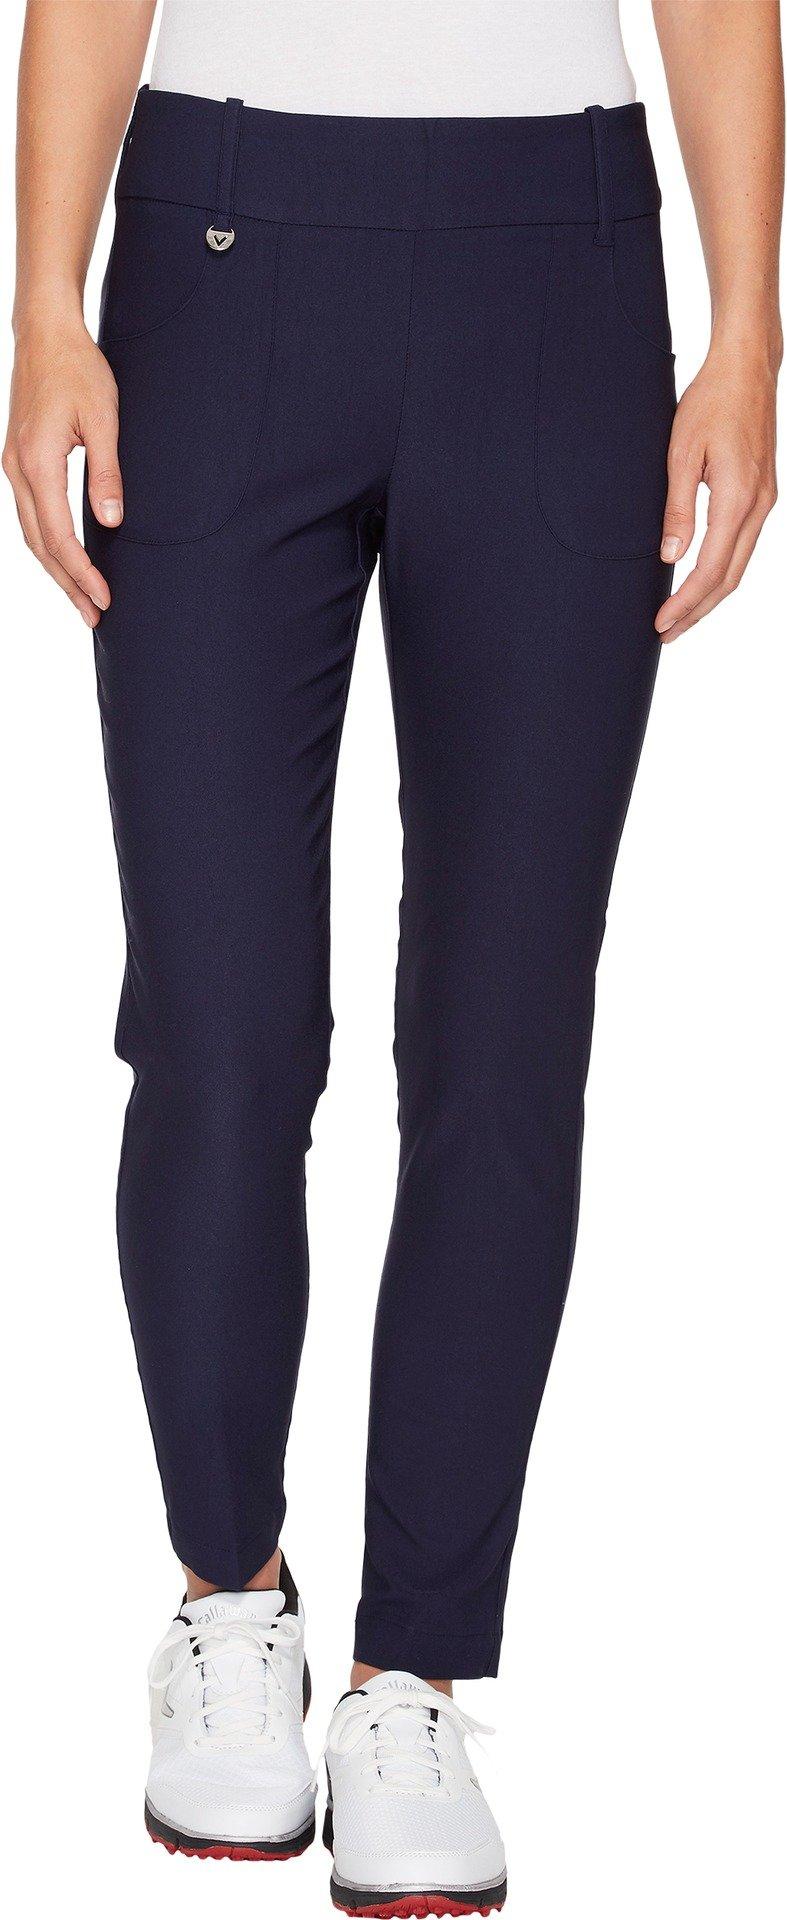 Callaway Womens Tech Stretch Trousers Peacoat LG 29